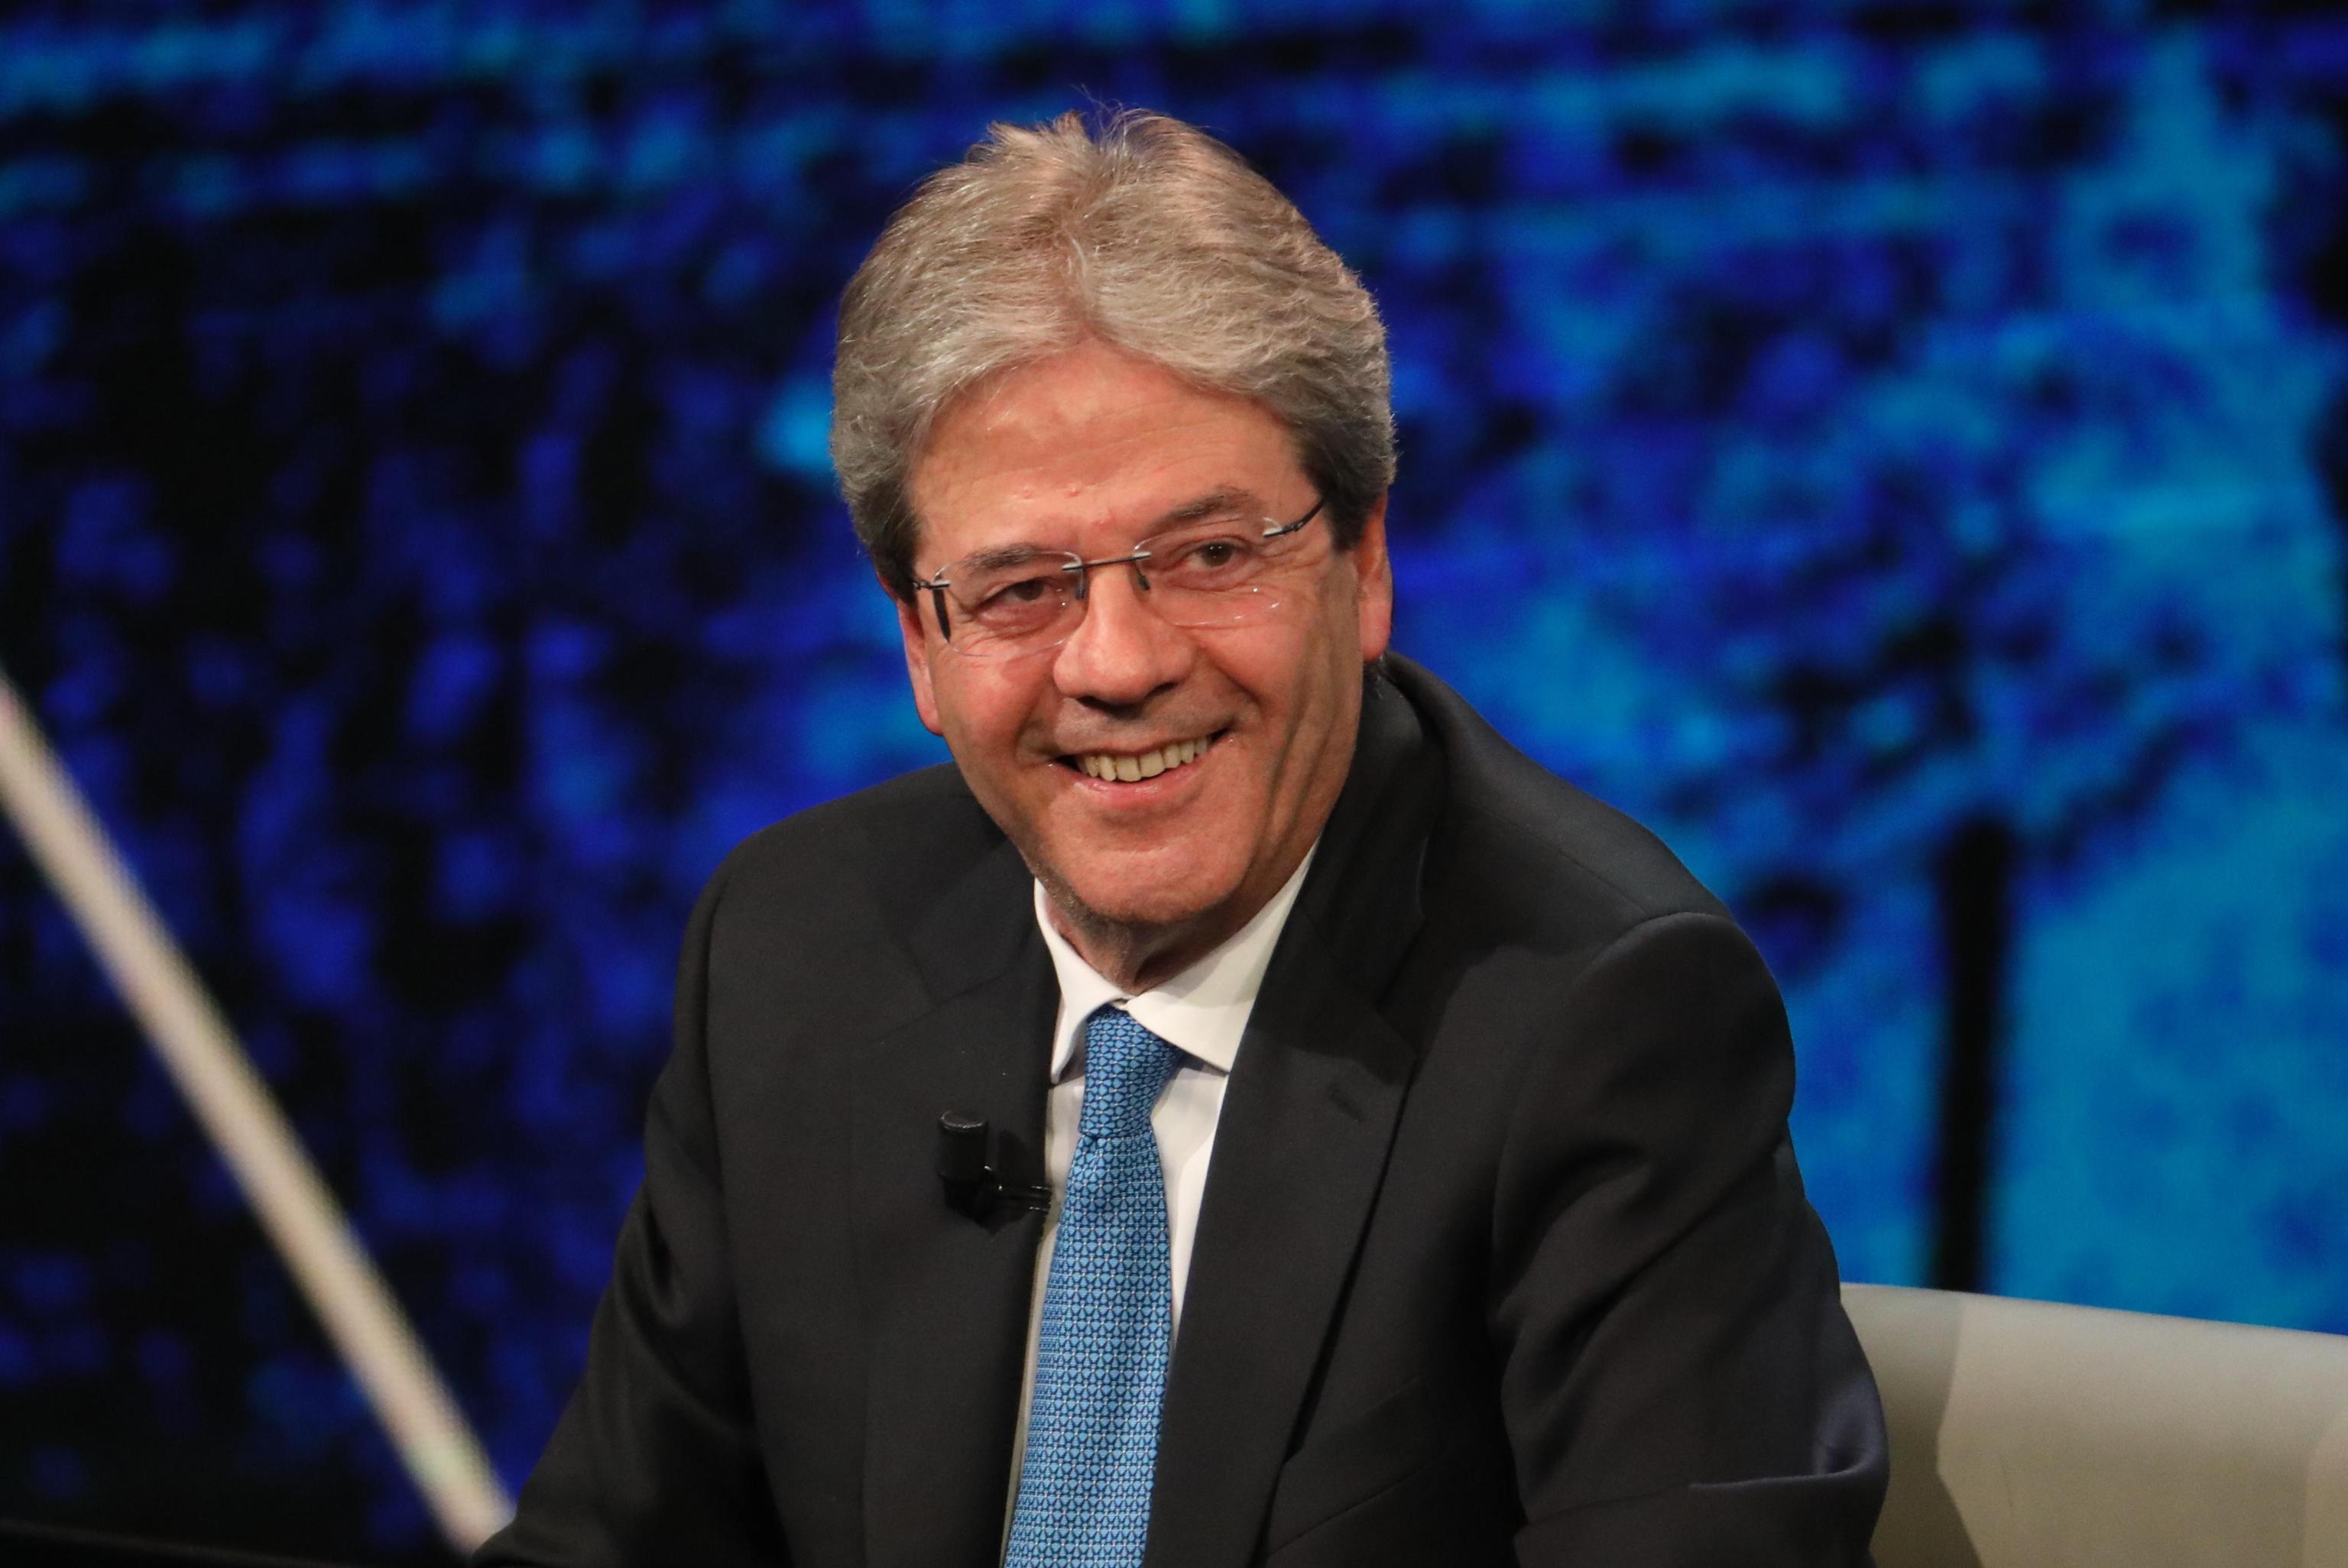 Italian Prime Minister Paolo Gentiloni on RAI TV